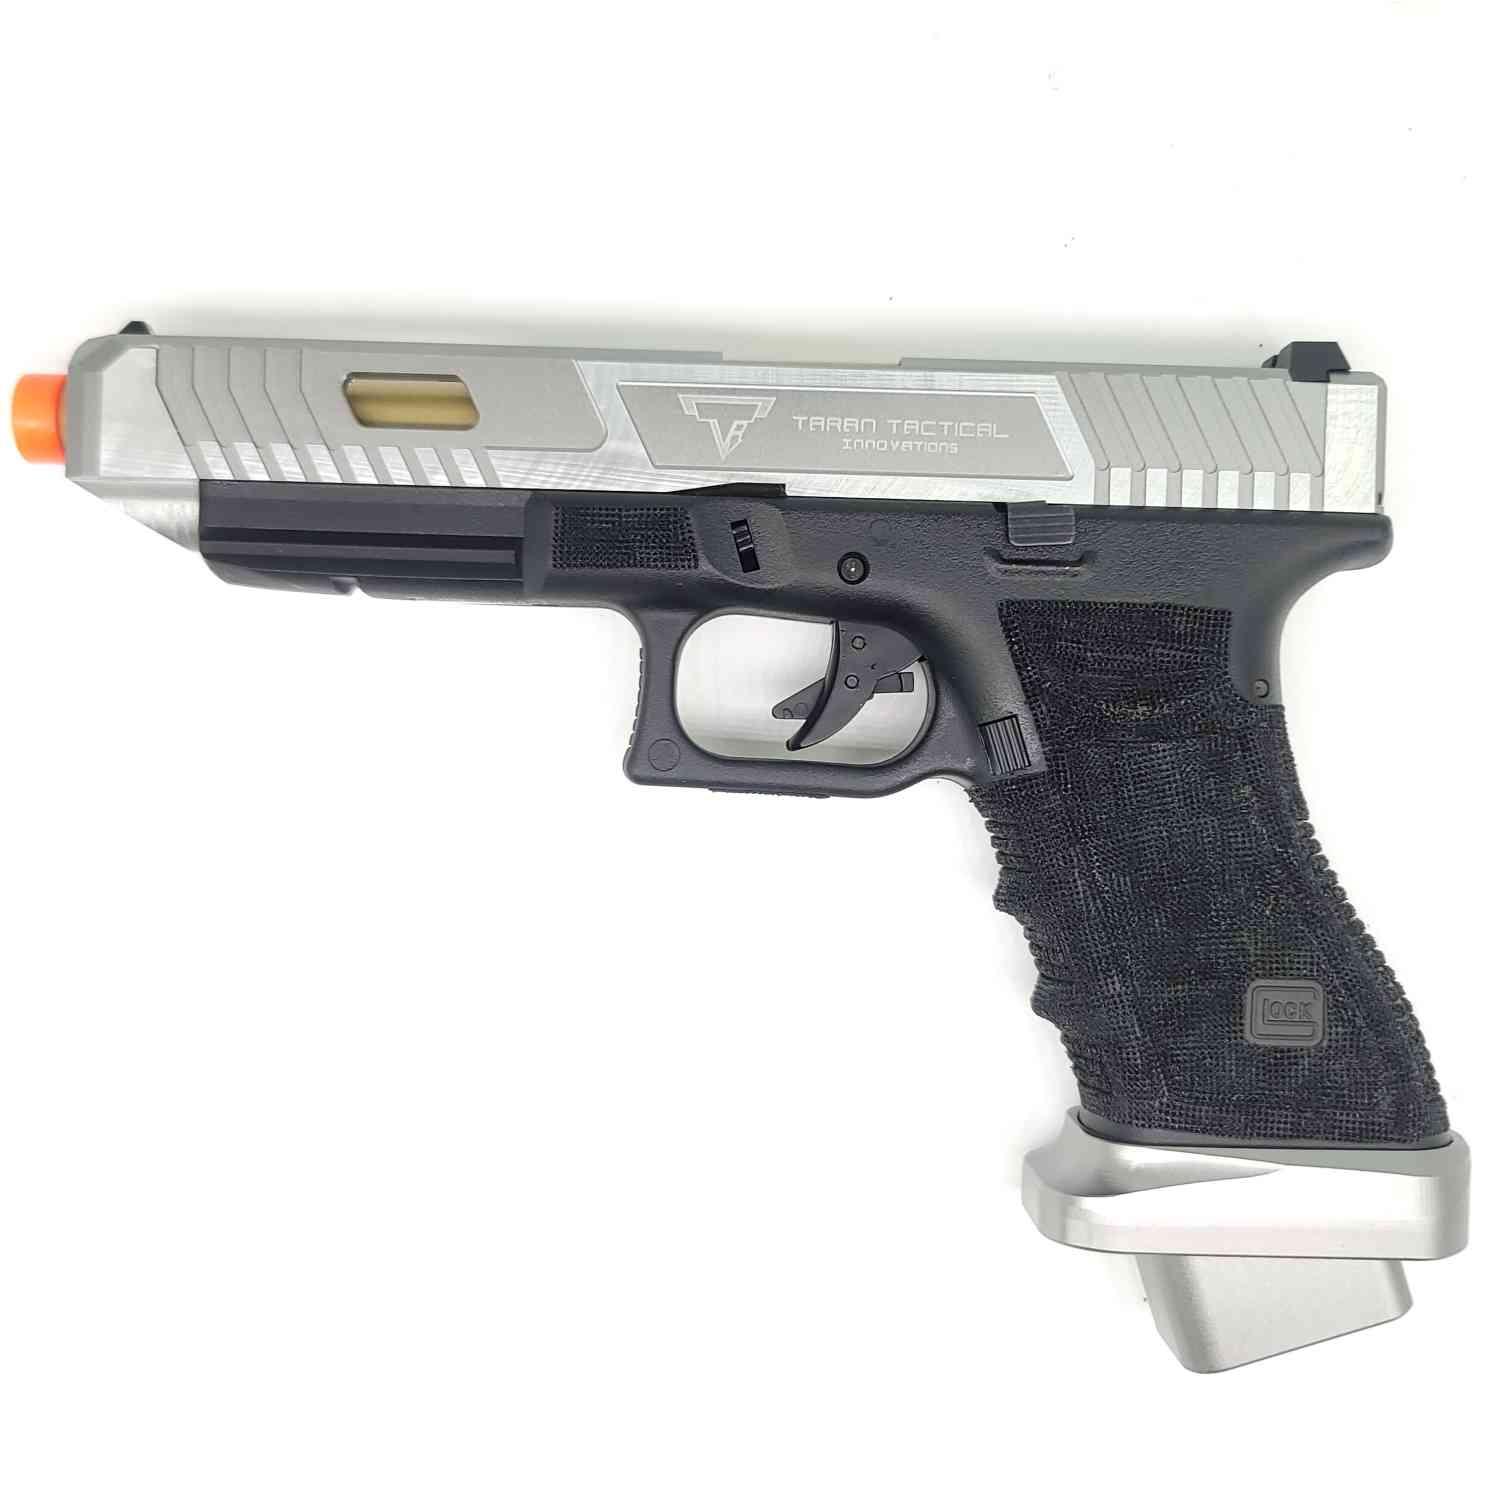 DOUBLE BELL Glock G34 TTI John Wick 2 Combat Master Custom Gas Powered Gel Blaster BILLET ALLOY SLIDE [768L]